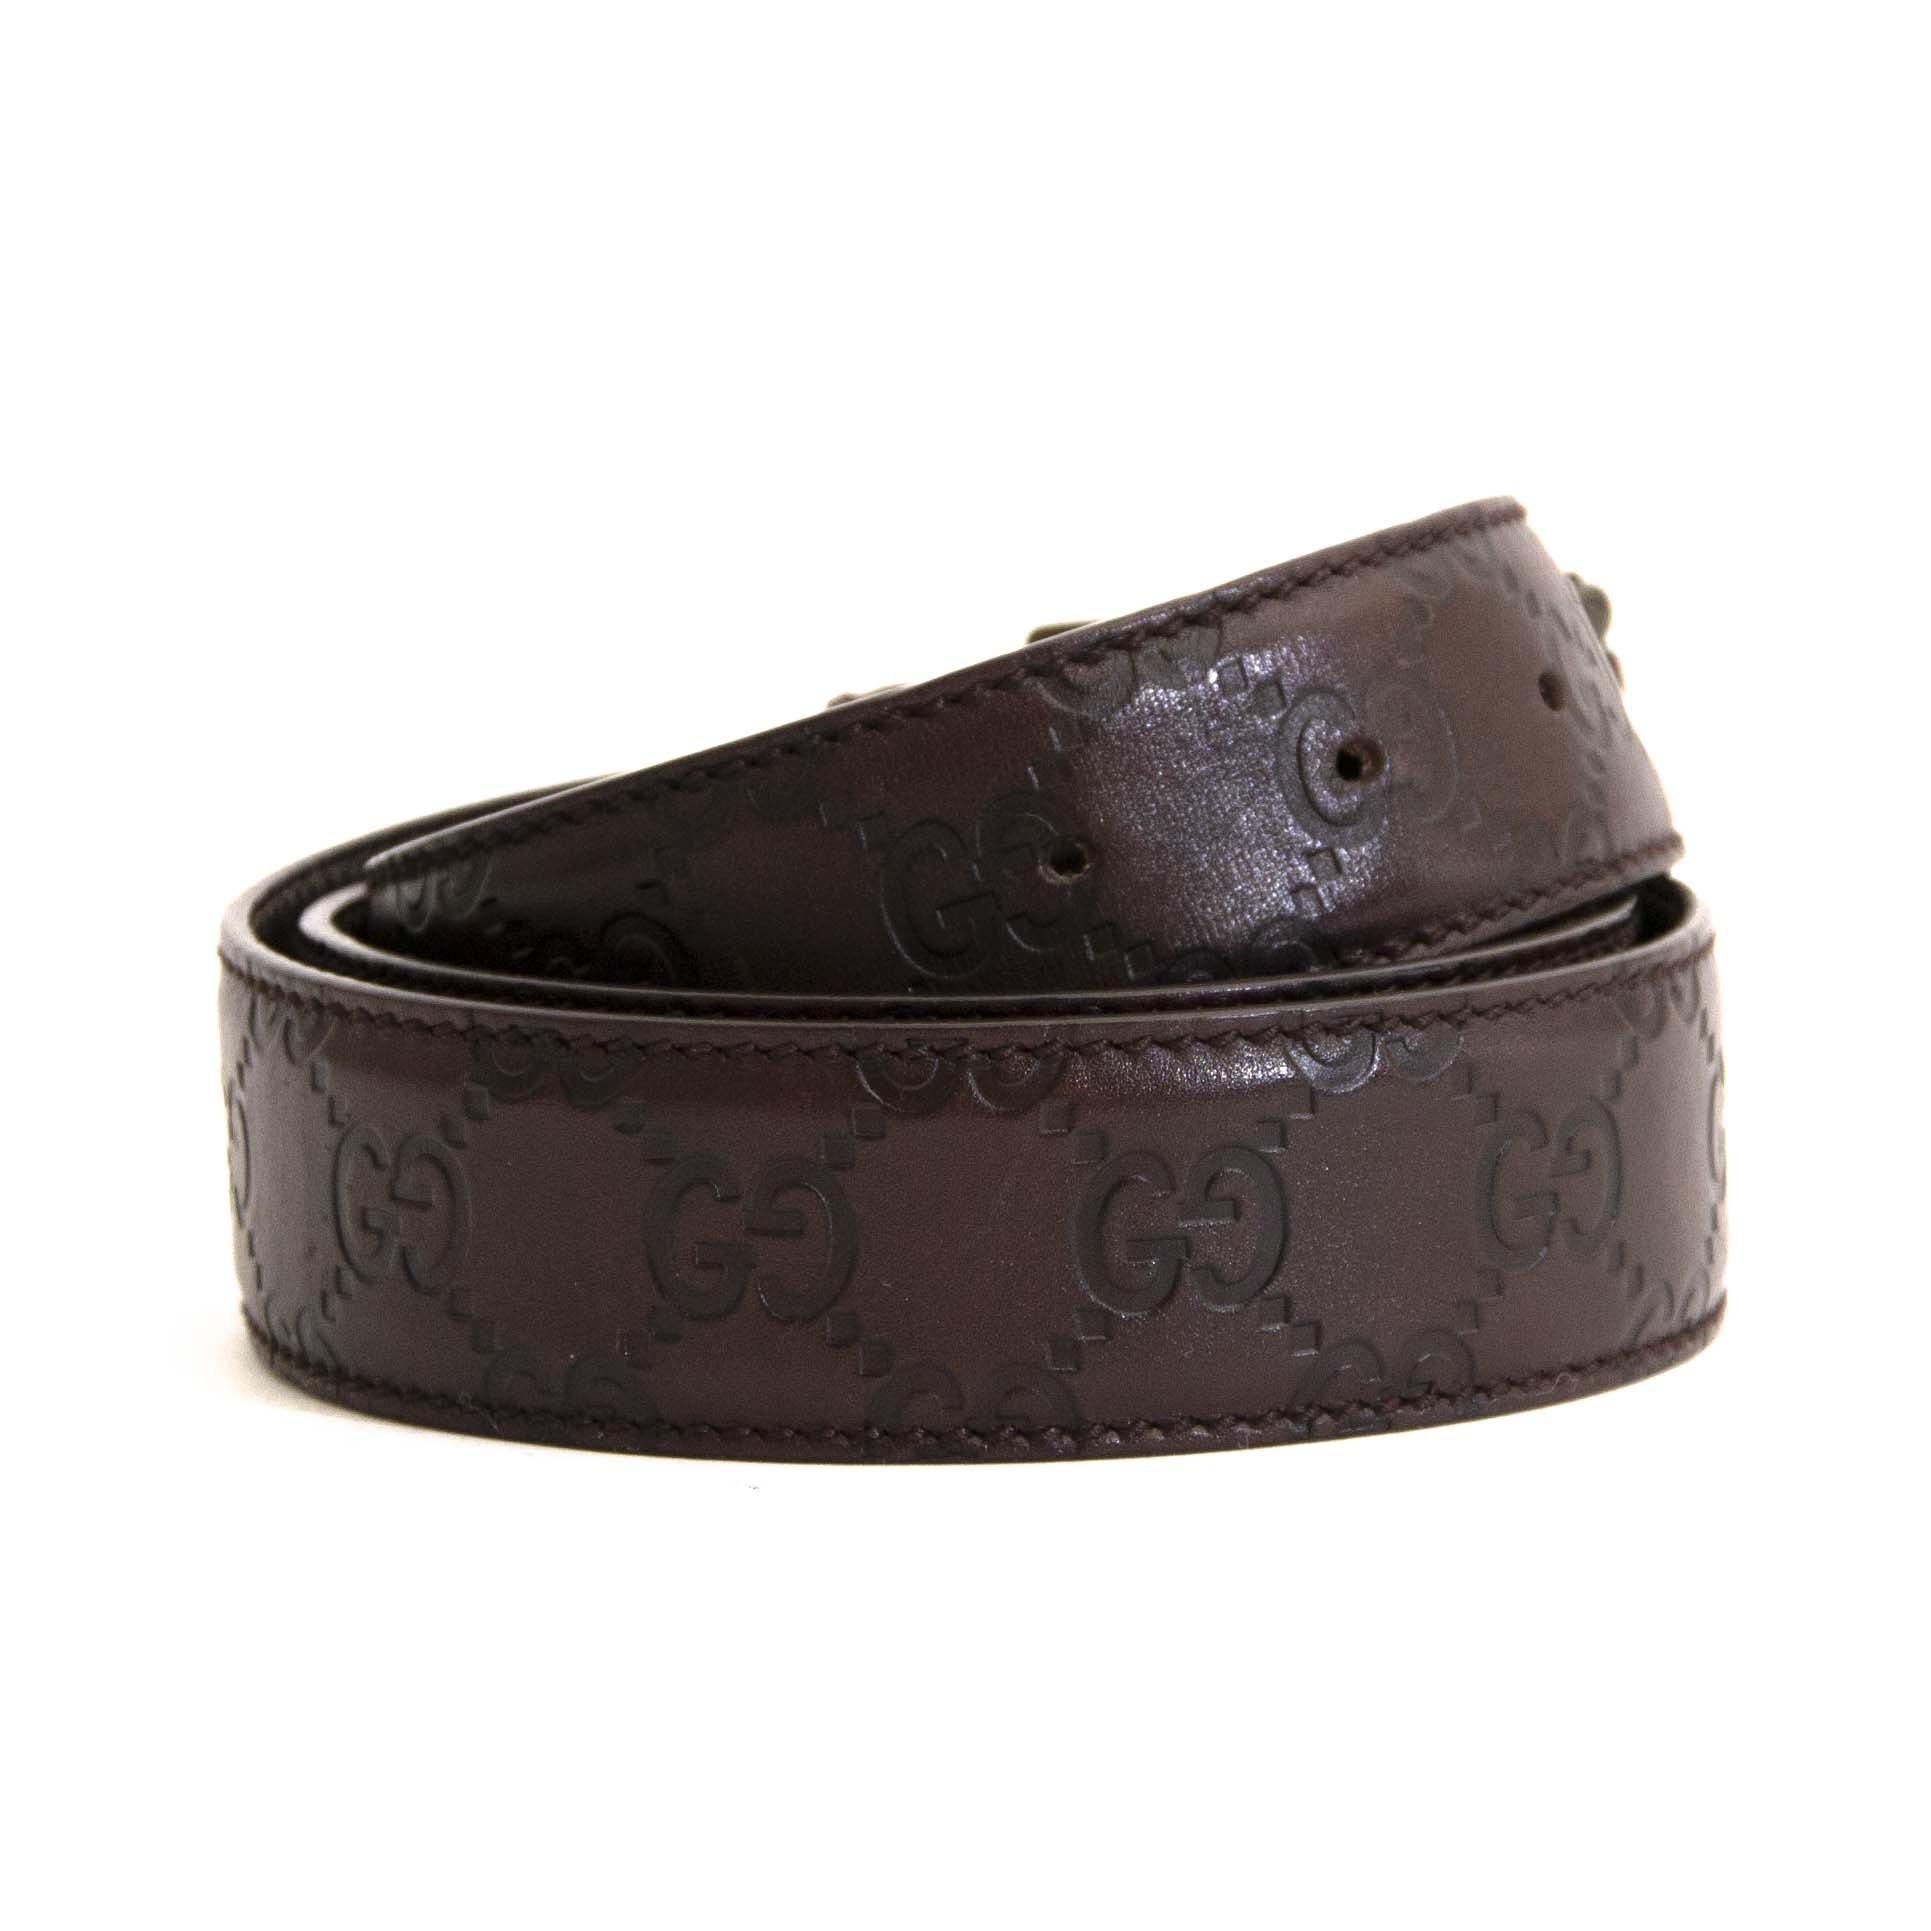 2364b8871f2 ... acheter en ligne seconde main Gucci Dark Brown Leather Logo Belt - Size  95